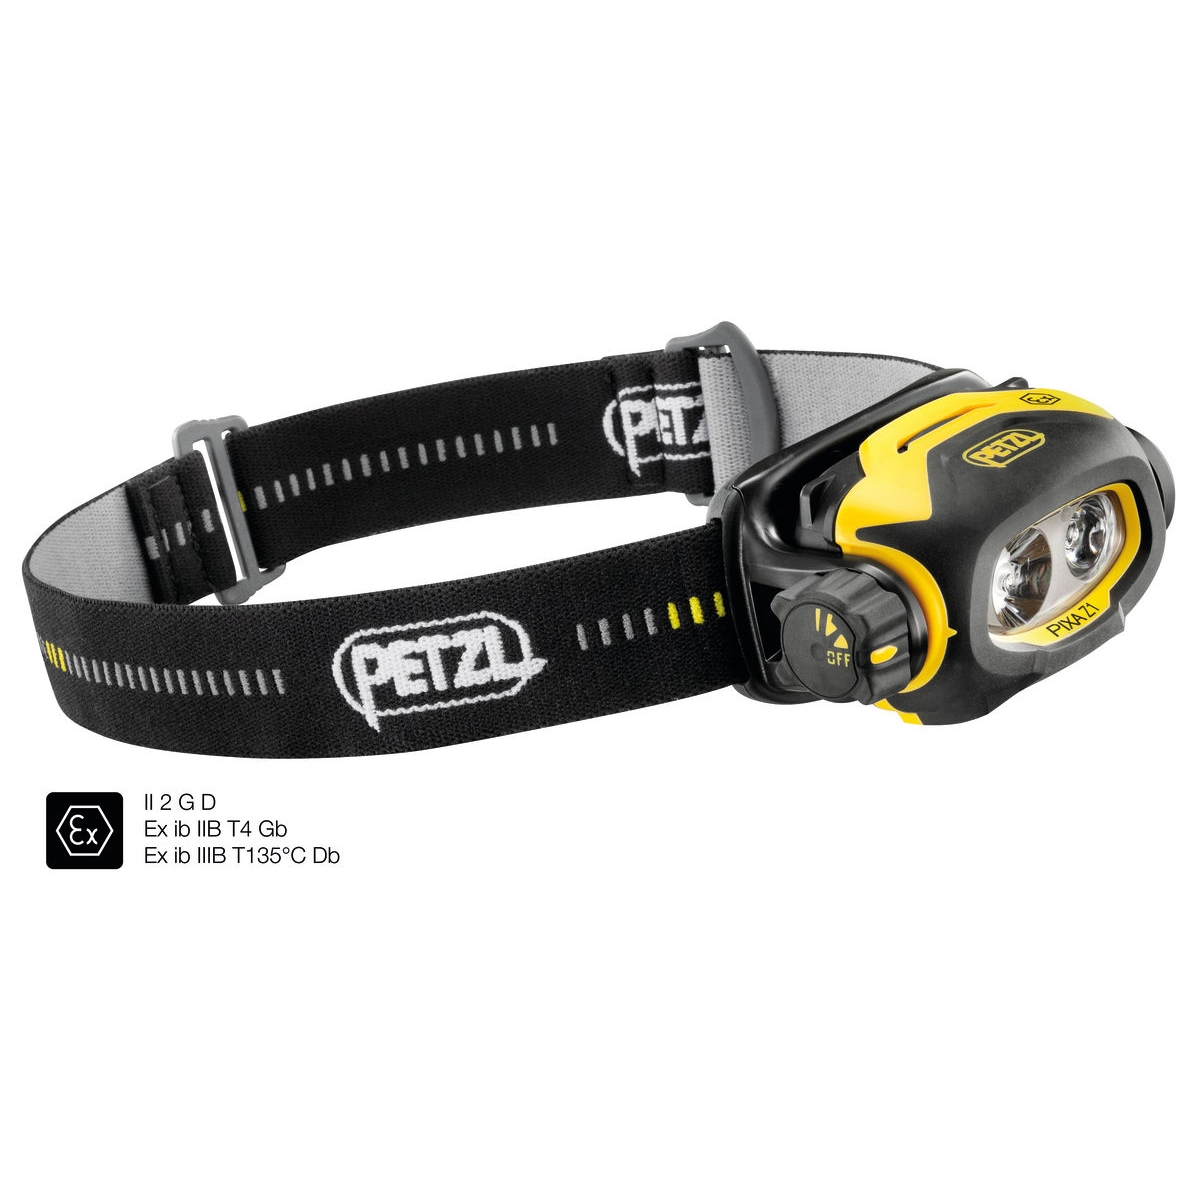 Petzl Pixa Z1 - Atex Zone 1/21 - Hoofdlamp